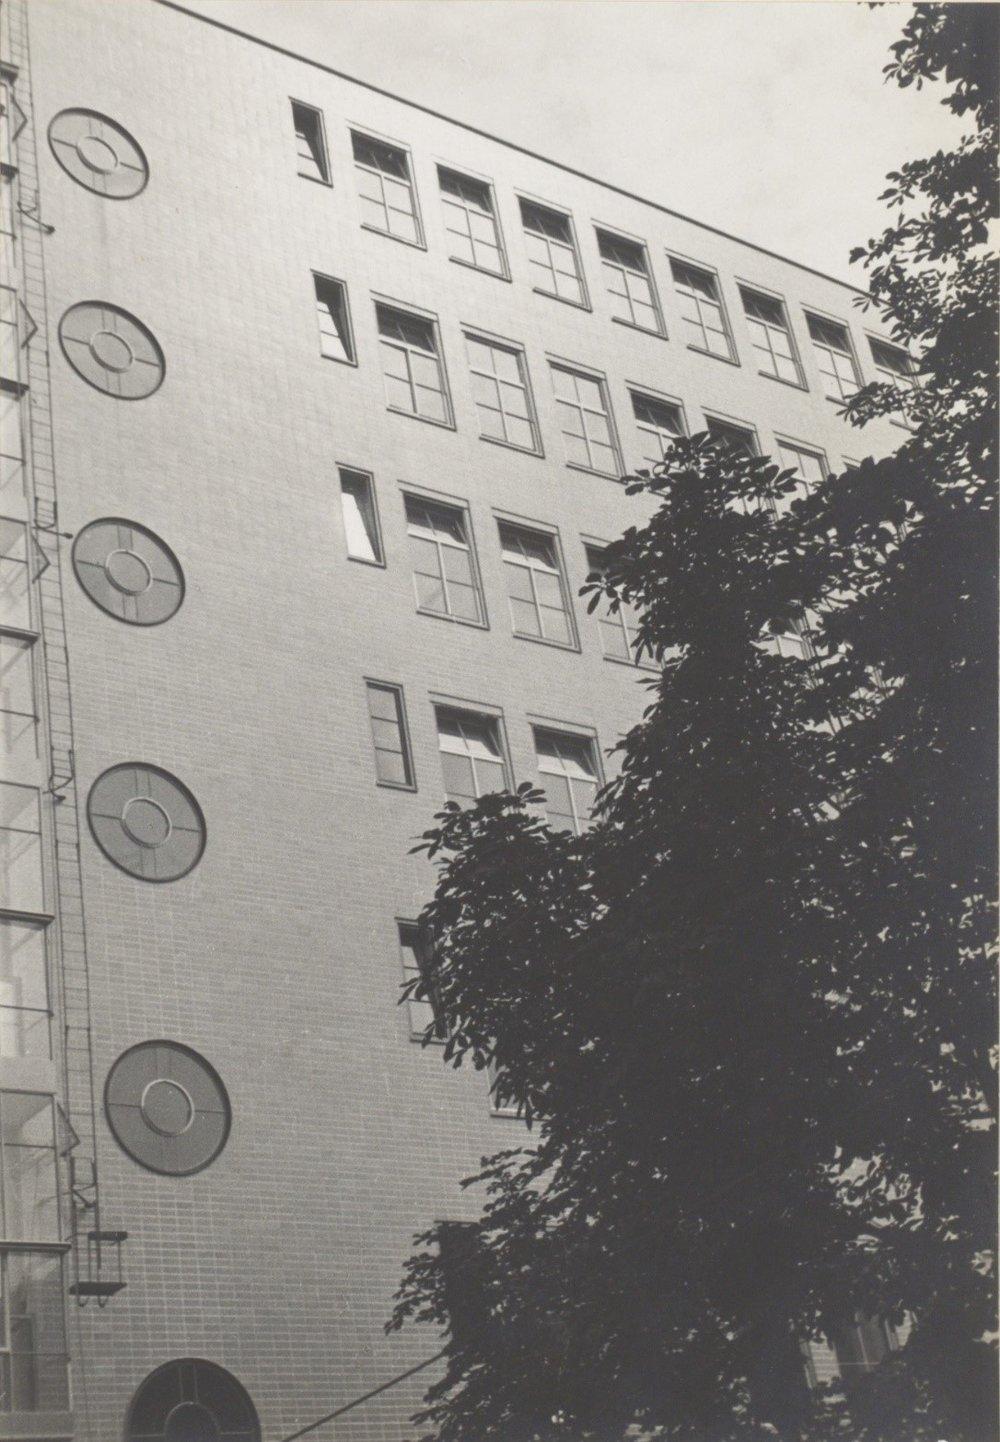 Voormalige Joodsche Invalide Amsterdam (thans GGD-gebouw)